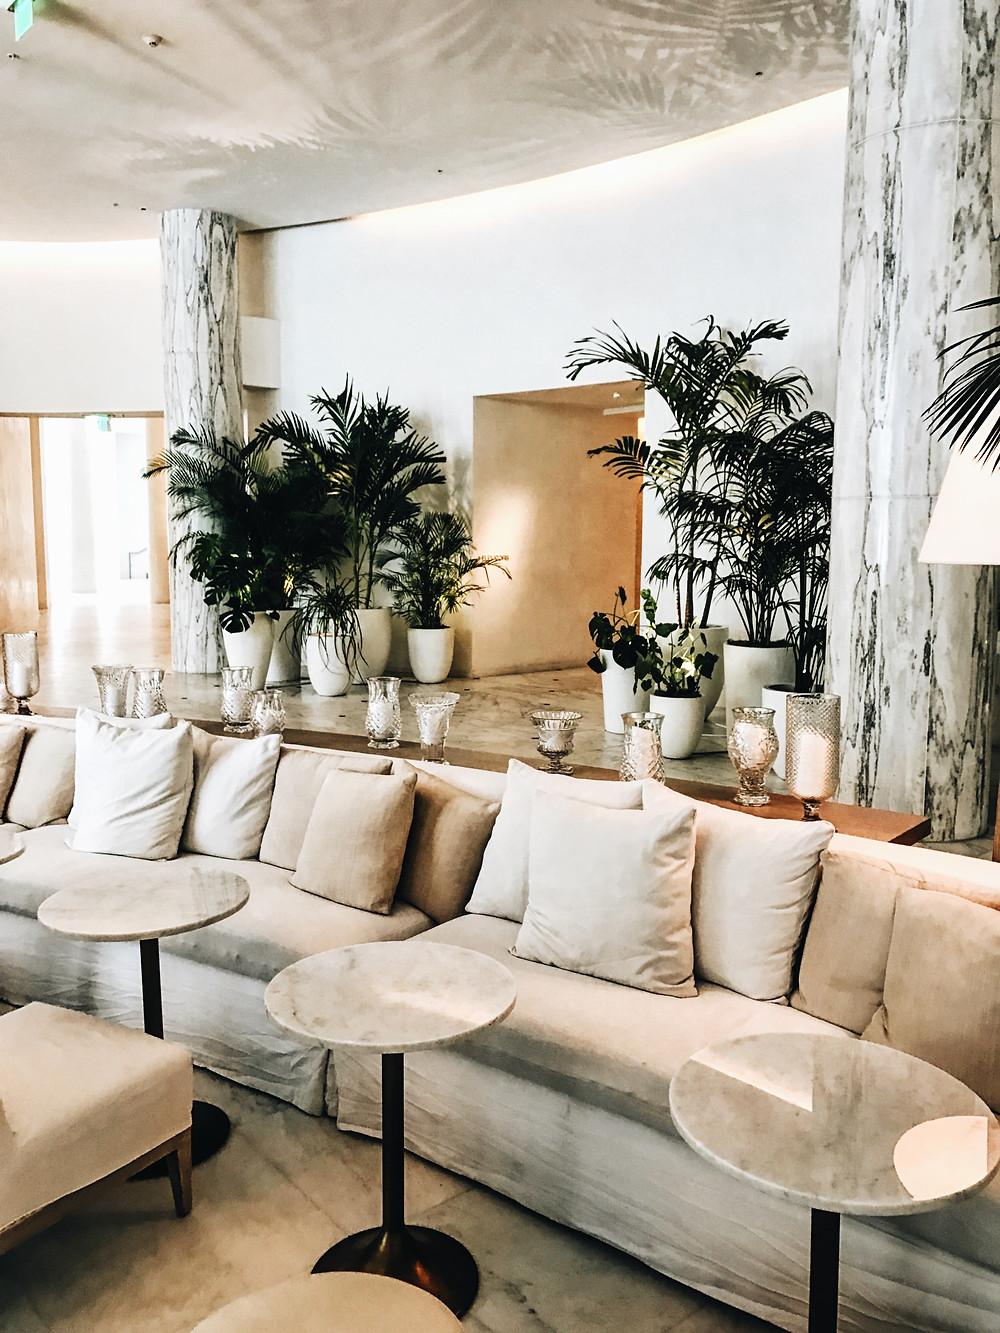 The lobby of the Miami Beach EDITION hotel.